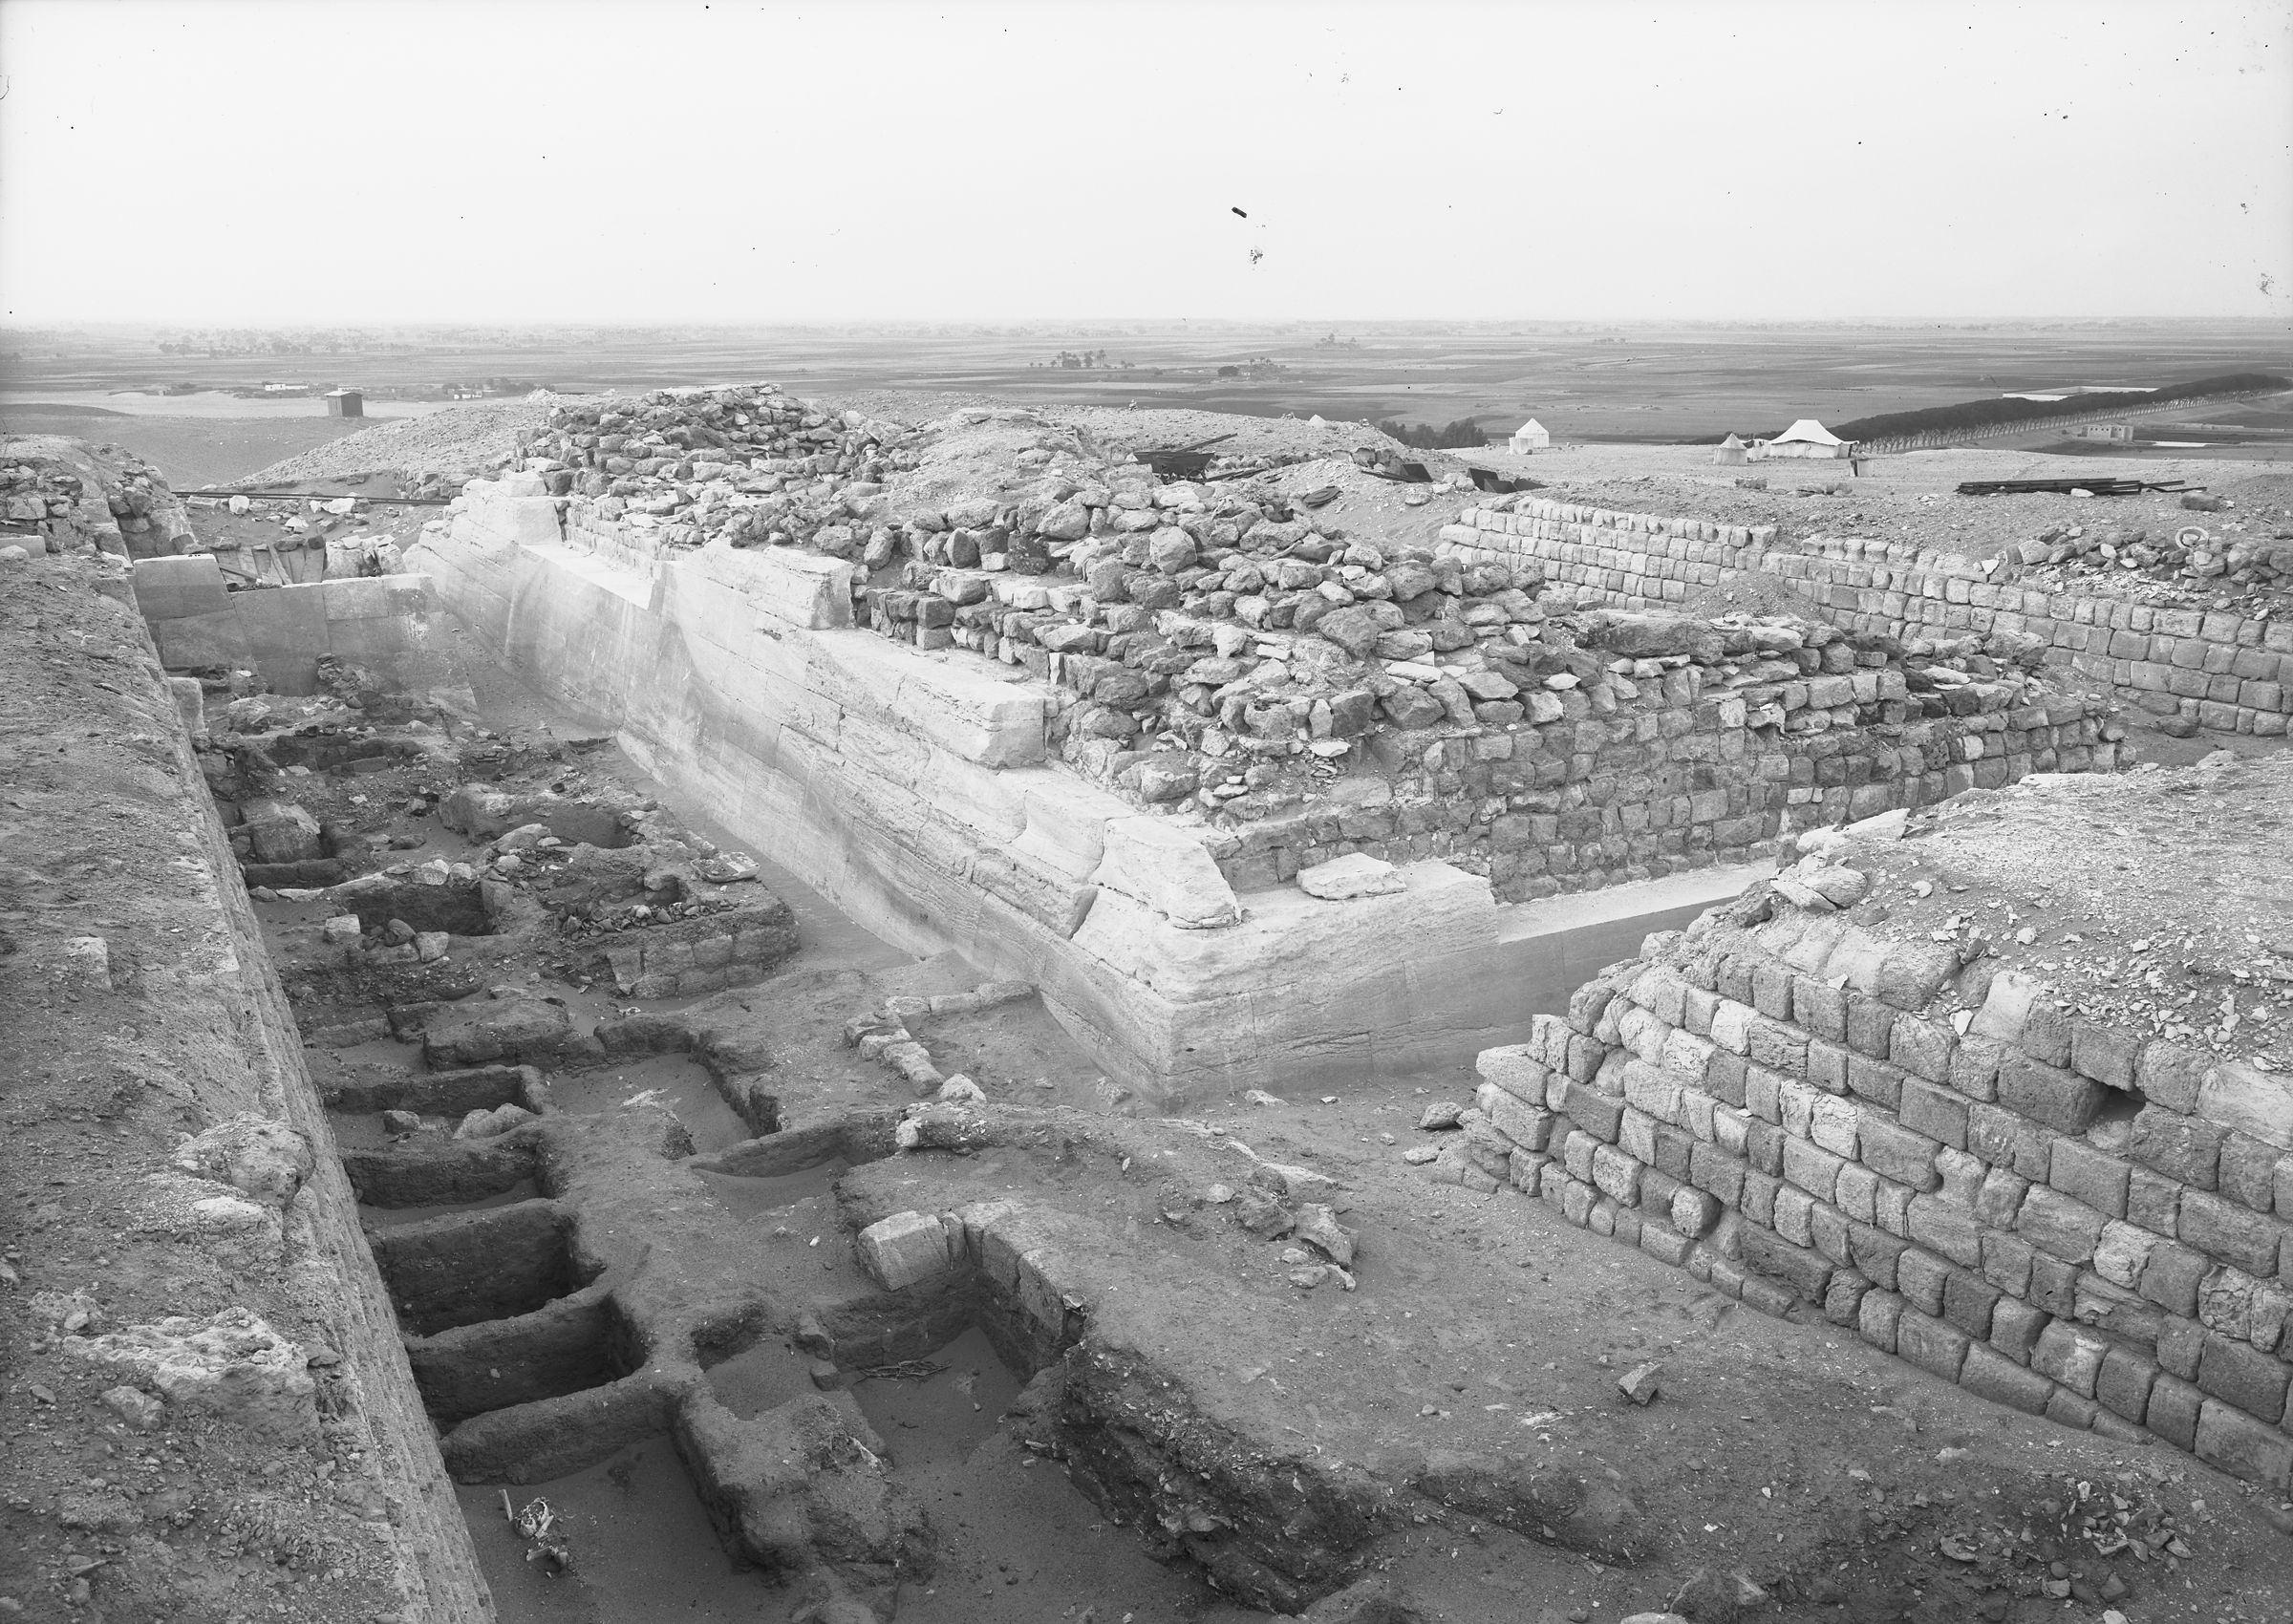 Western Cemetery: Site: Giza; View: G 2100, G 2130, G 2120, G 2105, G 2114